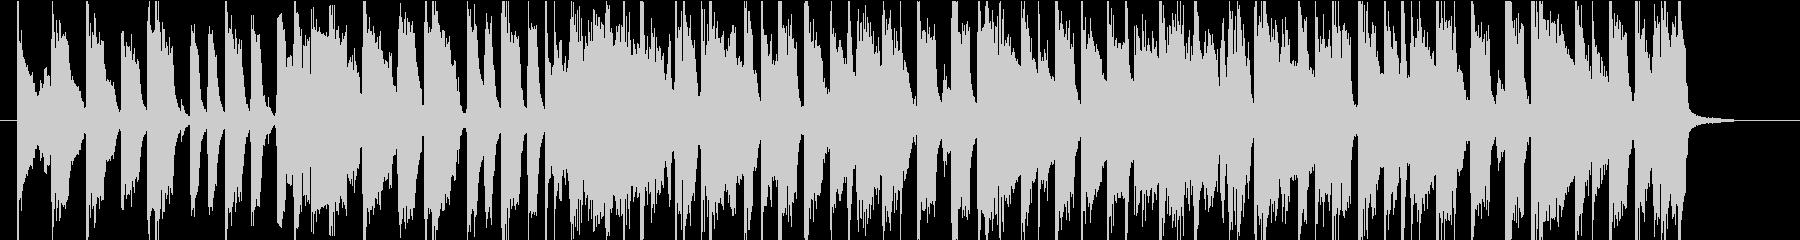 Jackson5風 ポップなオープニングの未再生の波形